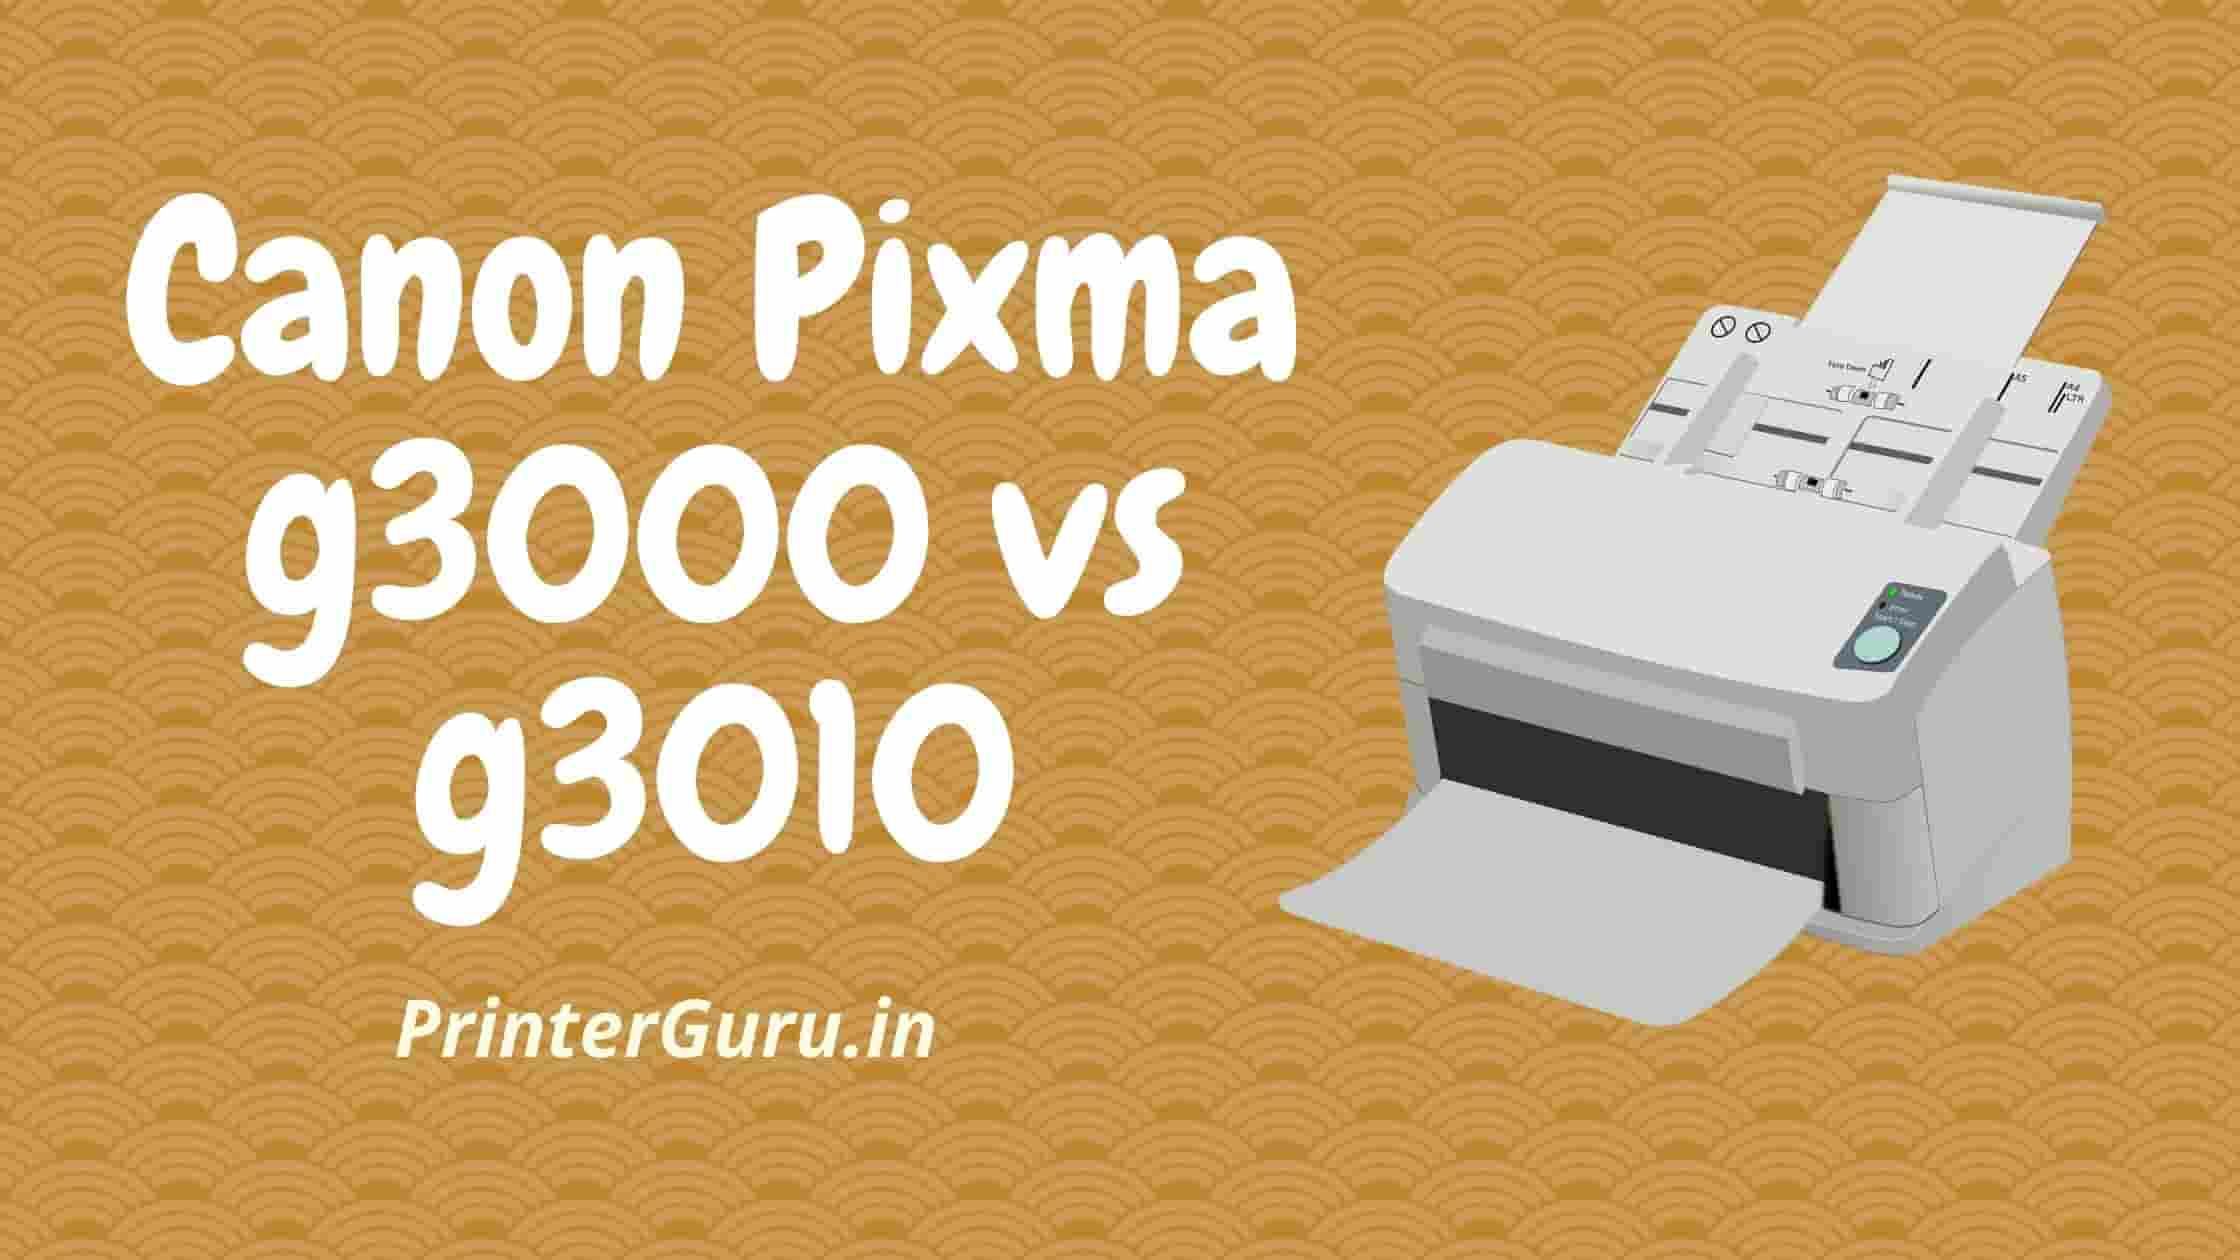 Canon Pixma g3000 vs g3010